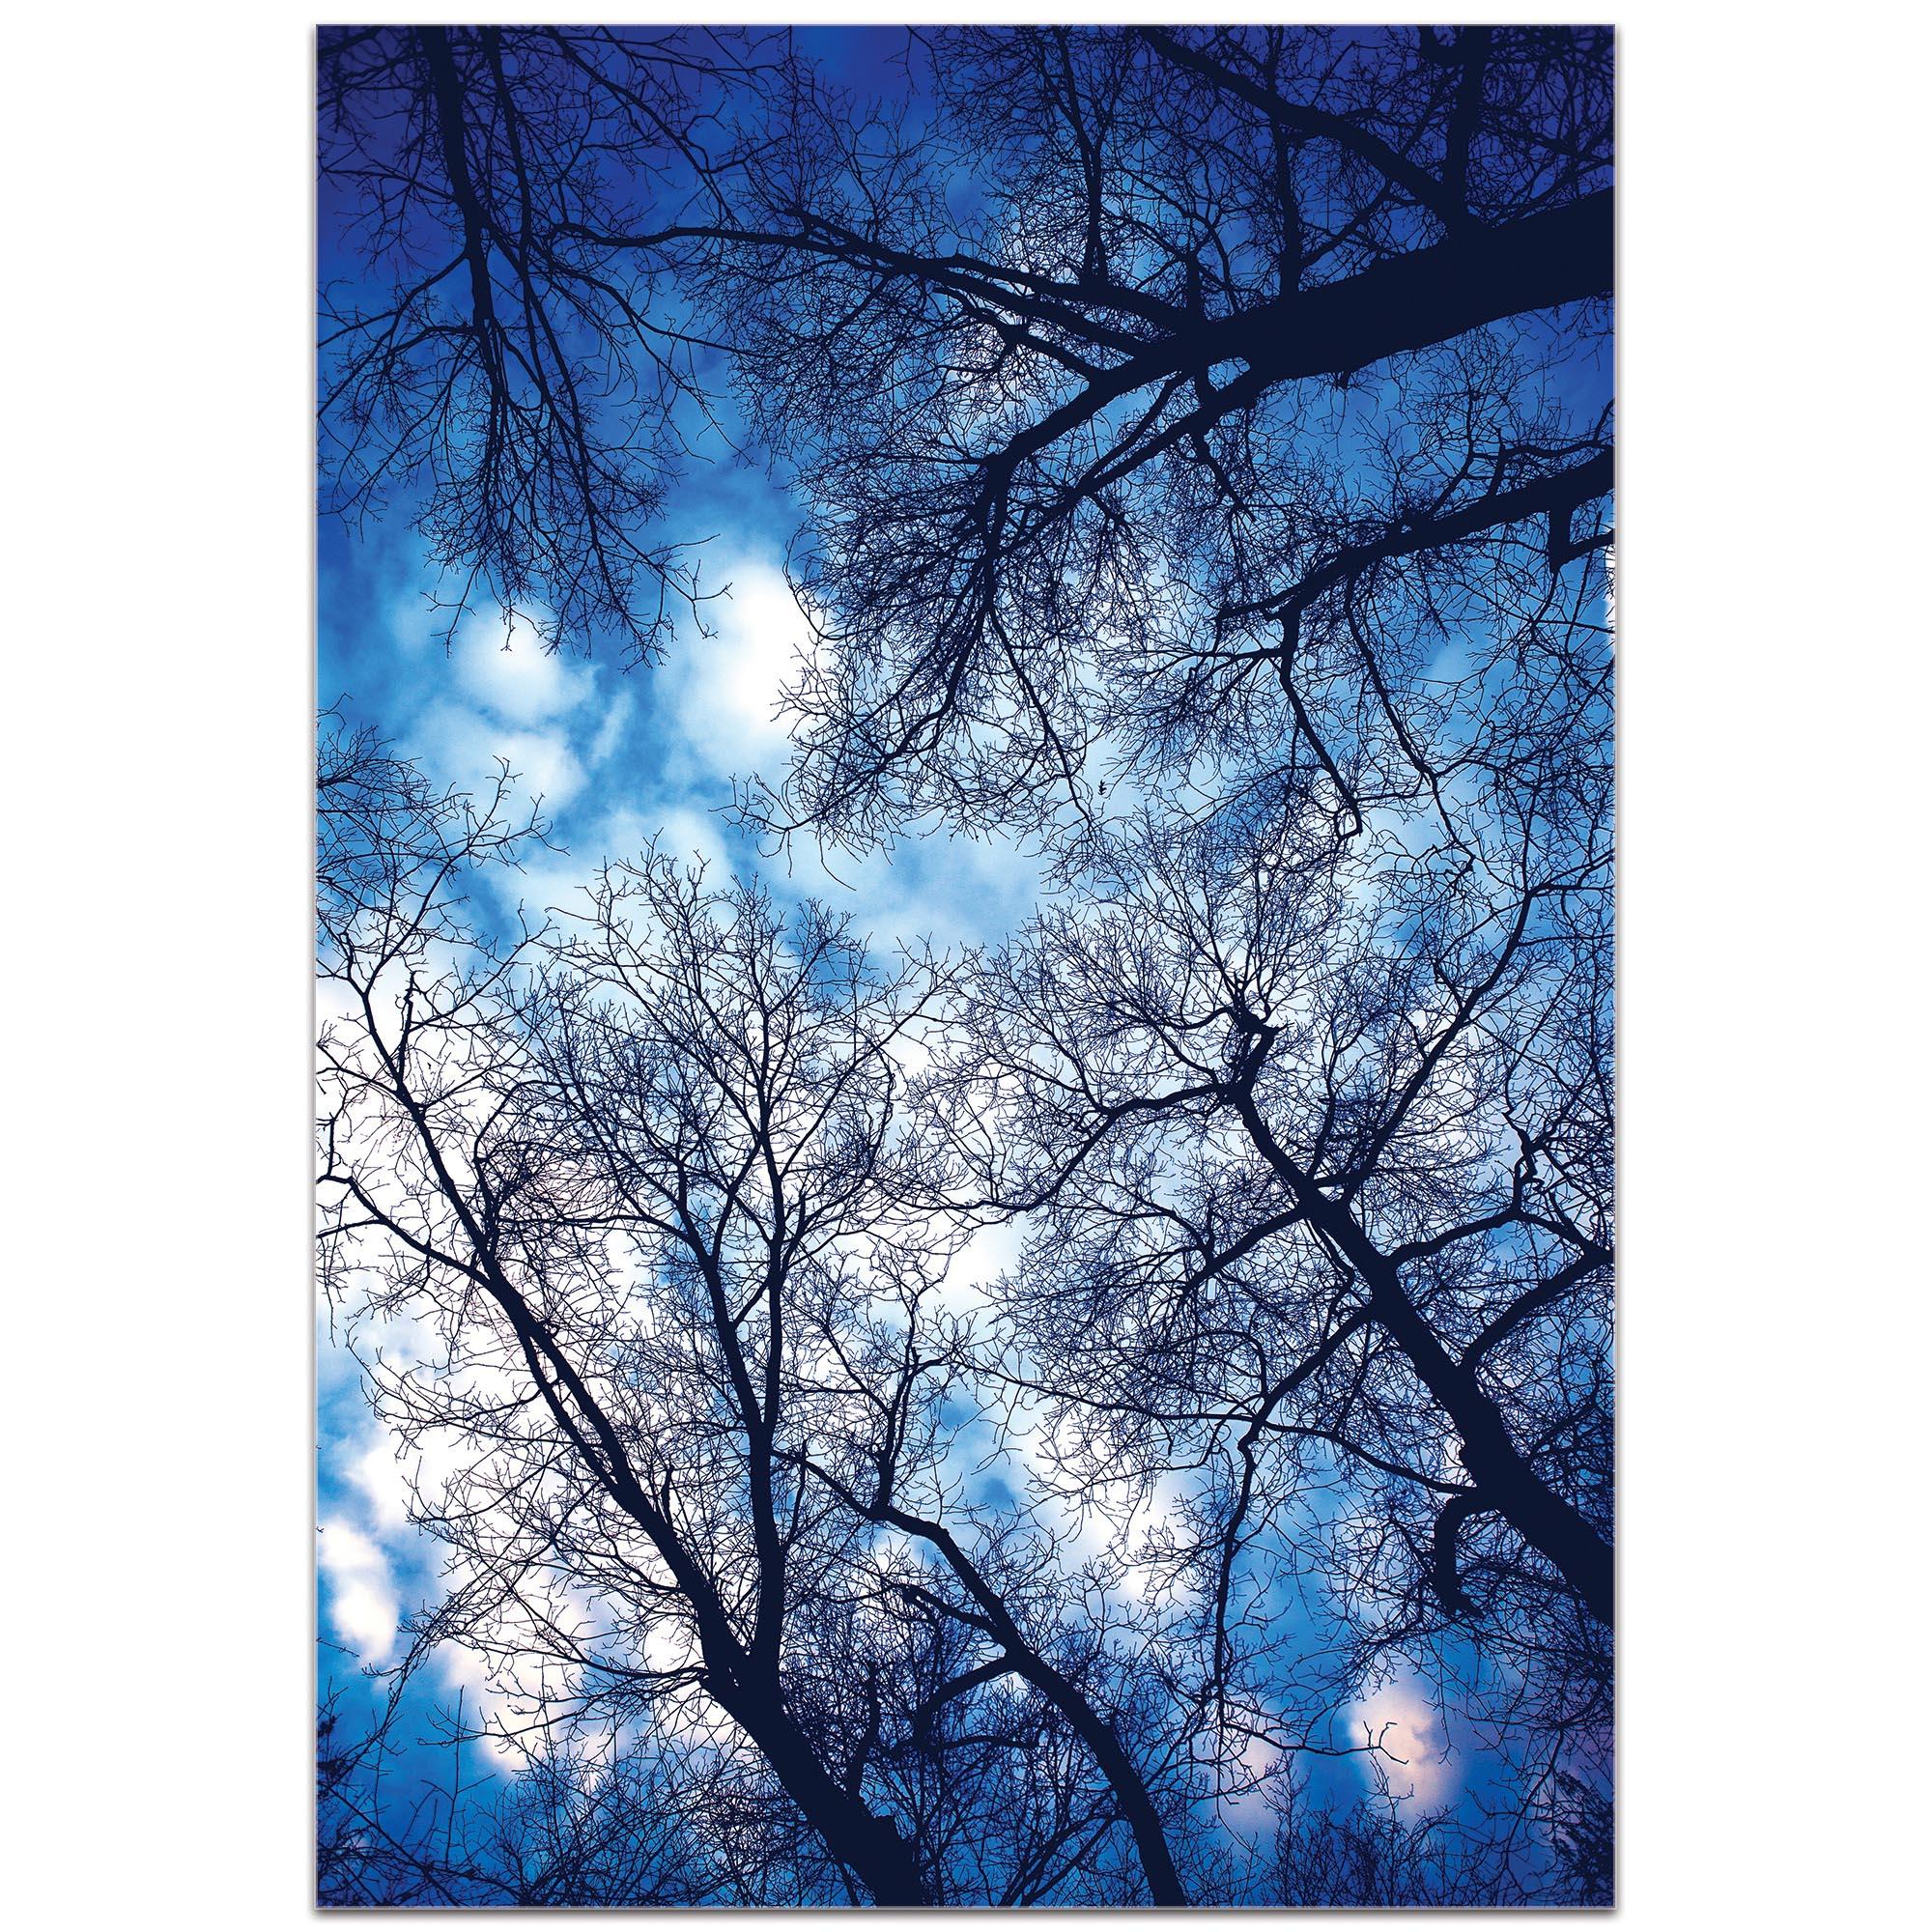 Landscape Photography 'Sky Vains' - Winter Scene Art on Metal or Plexiglass - Image 2